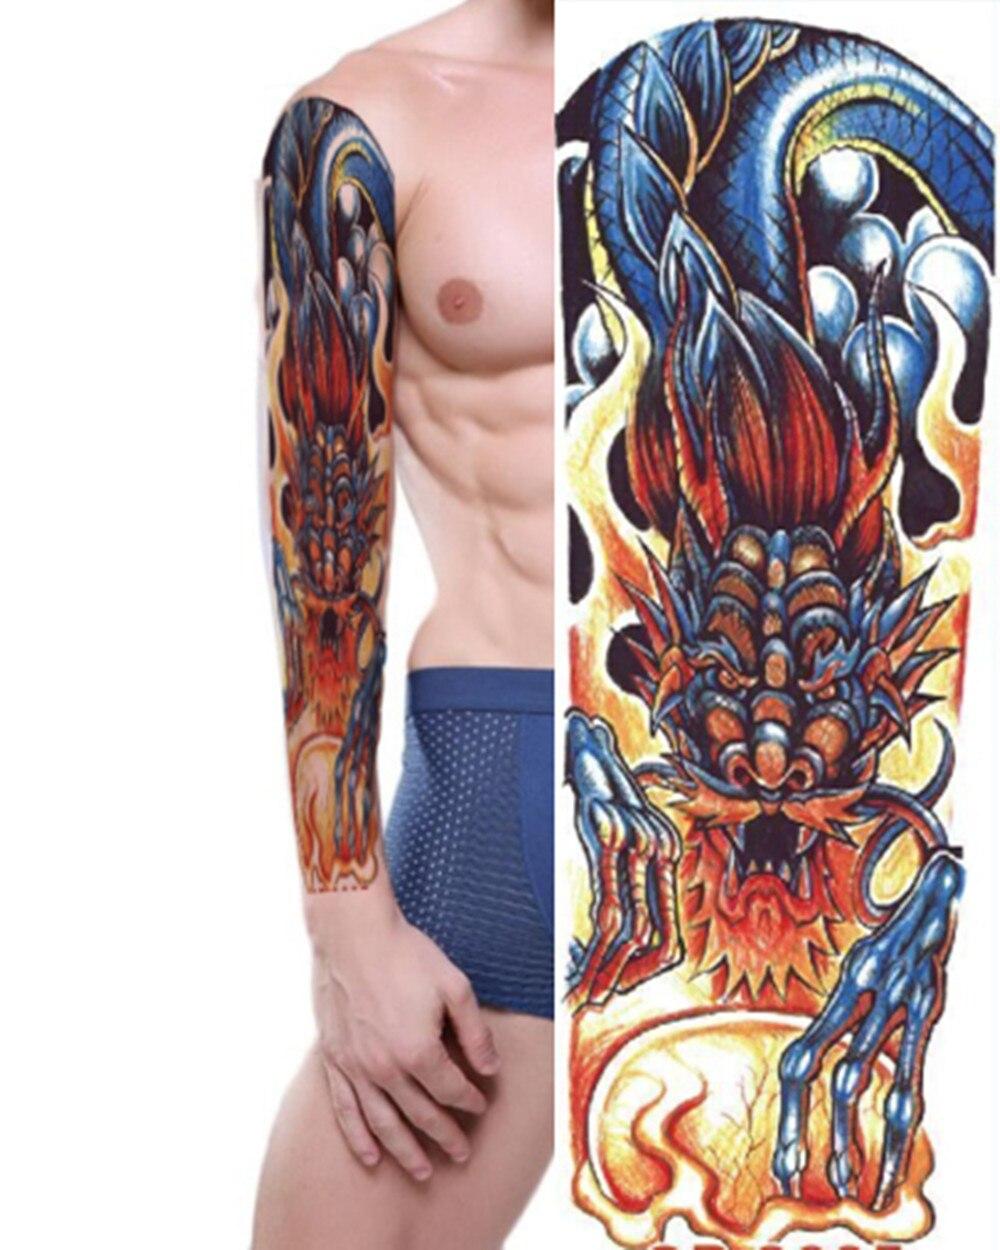 Tatouage fleur bras homme interesting tatouage homme main - Tatouage fleur bras ...